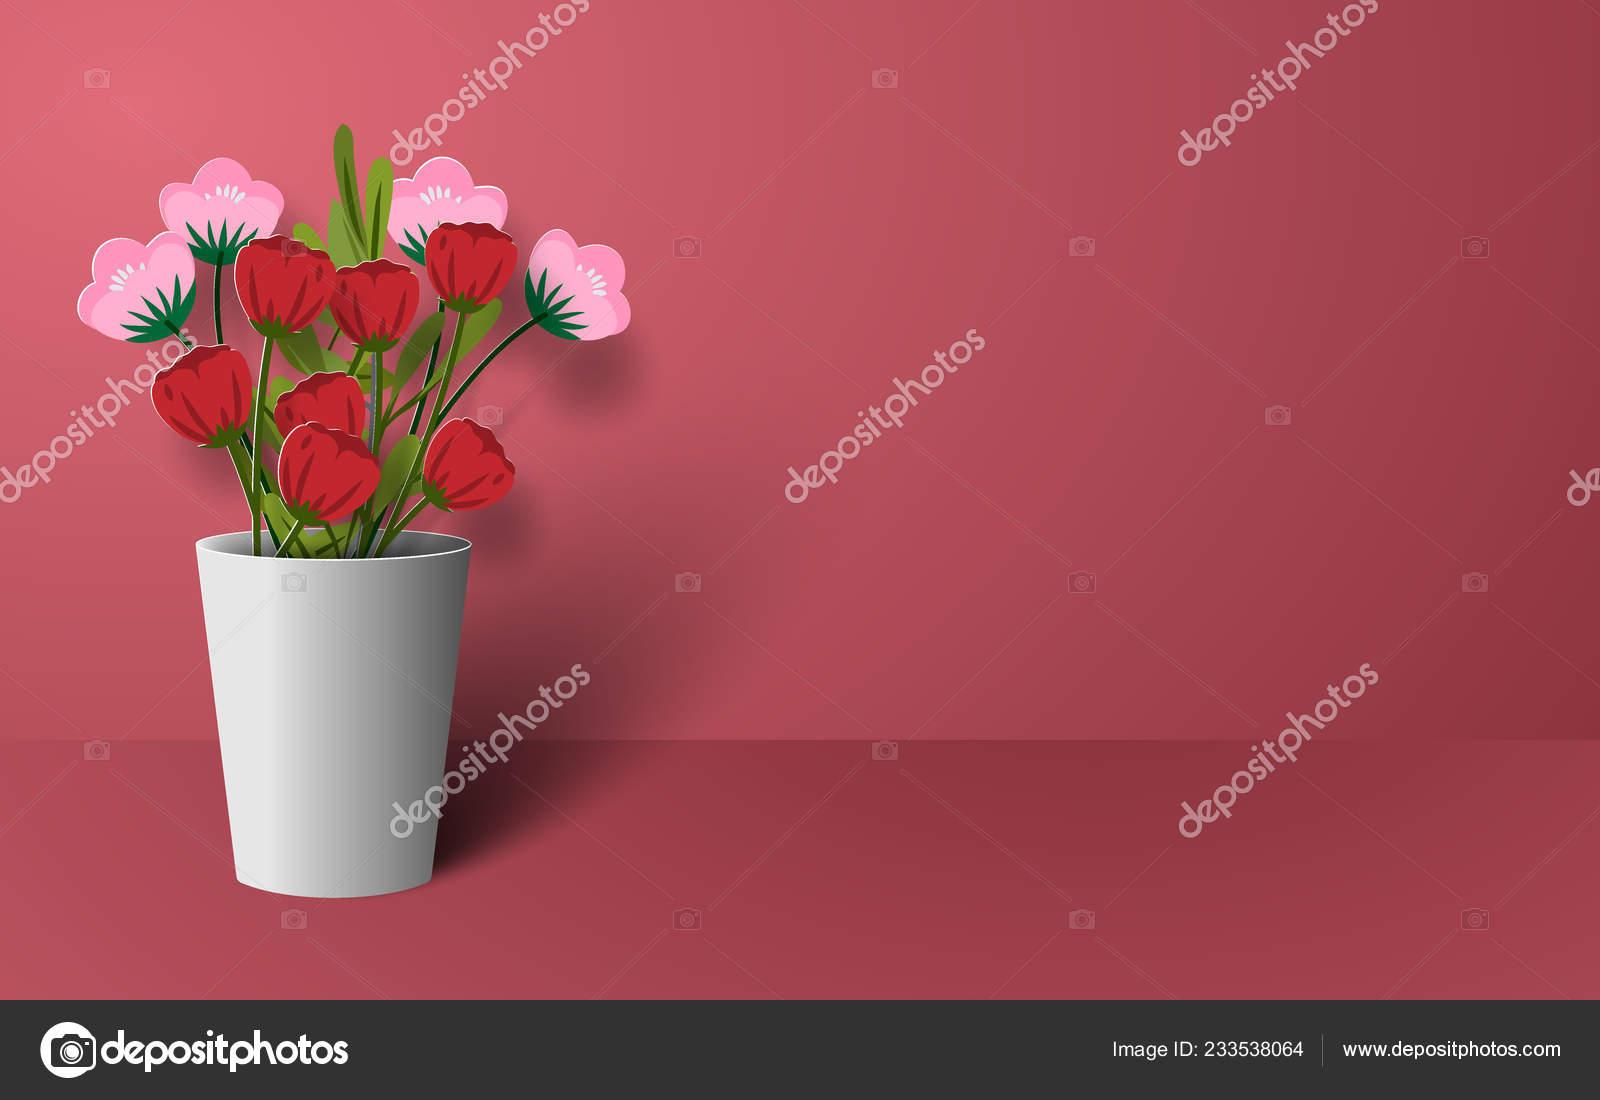 Depositphotos & Origami Paper Art Flower Vase Love Happy Valentine Day ...